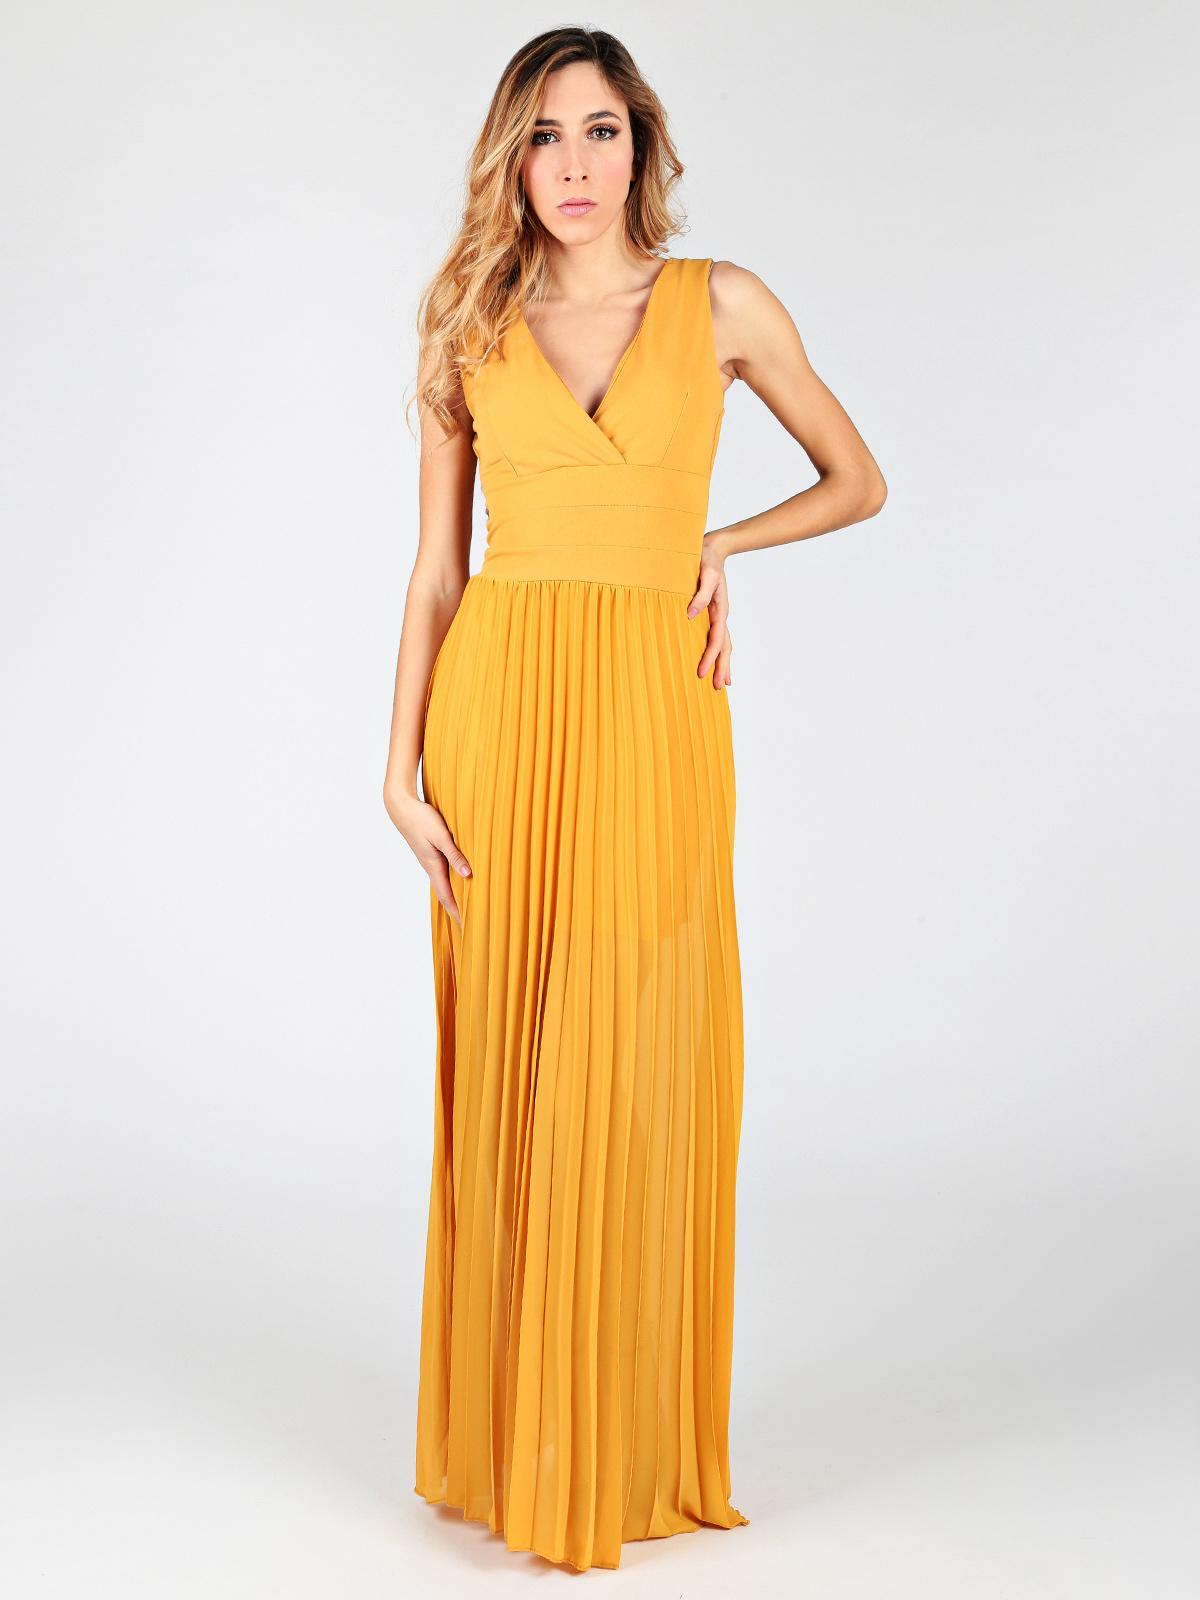 online store d6a38 5282a Vestito elegante con gonna lunga solada | MecShopping